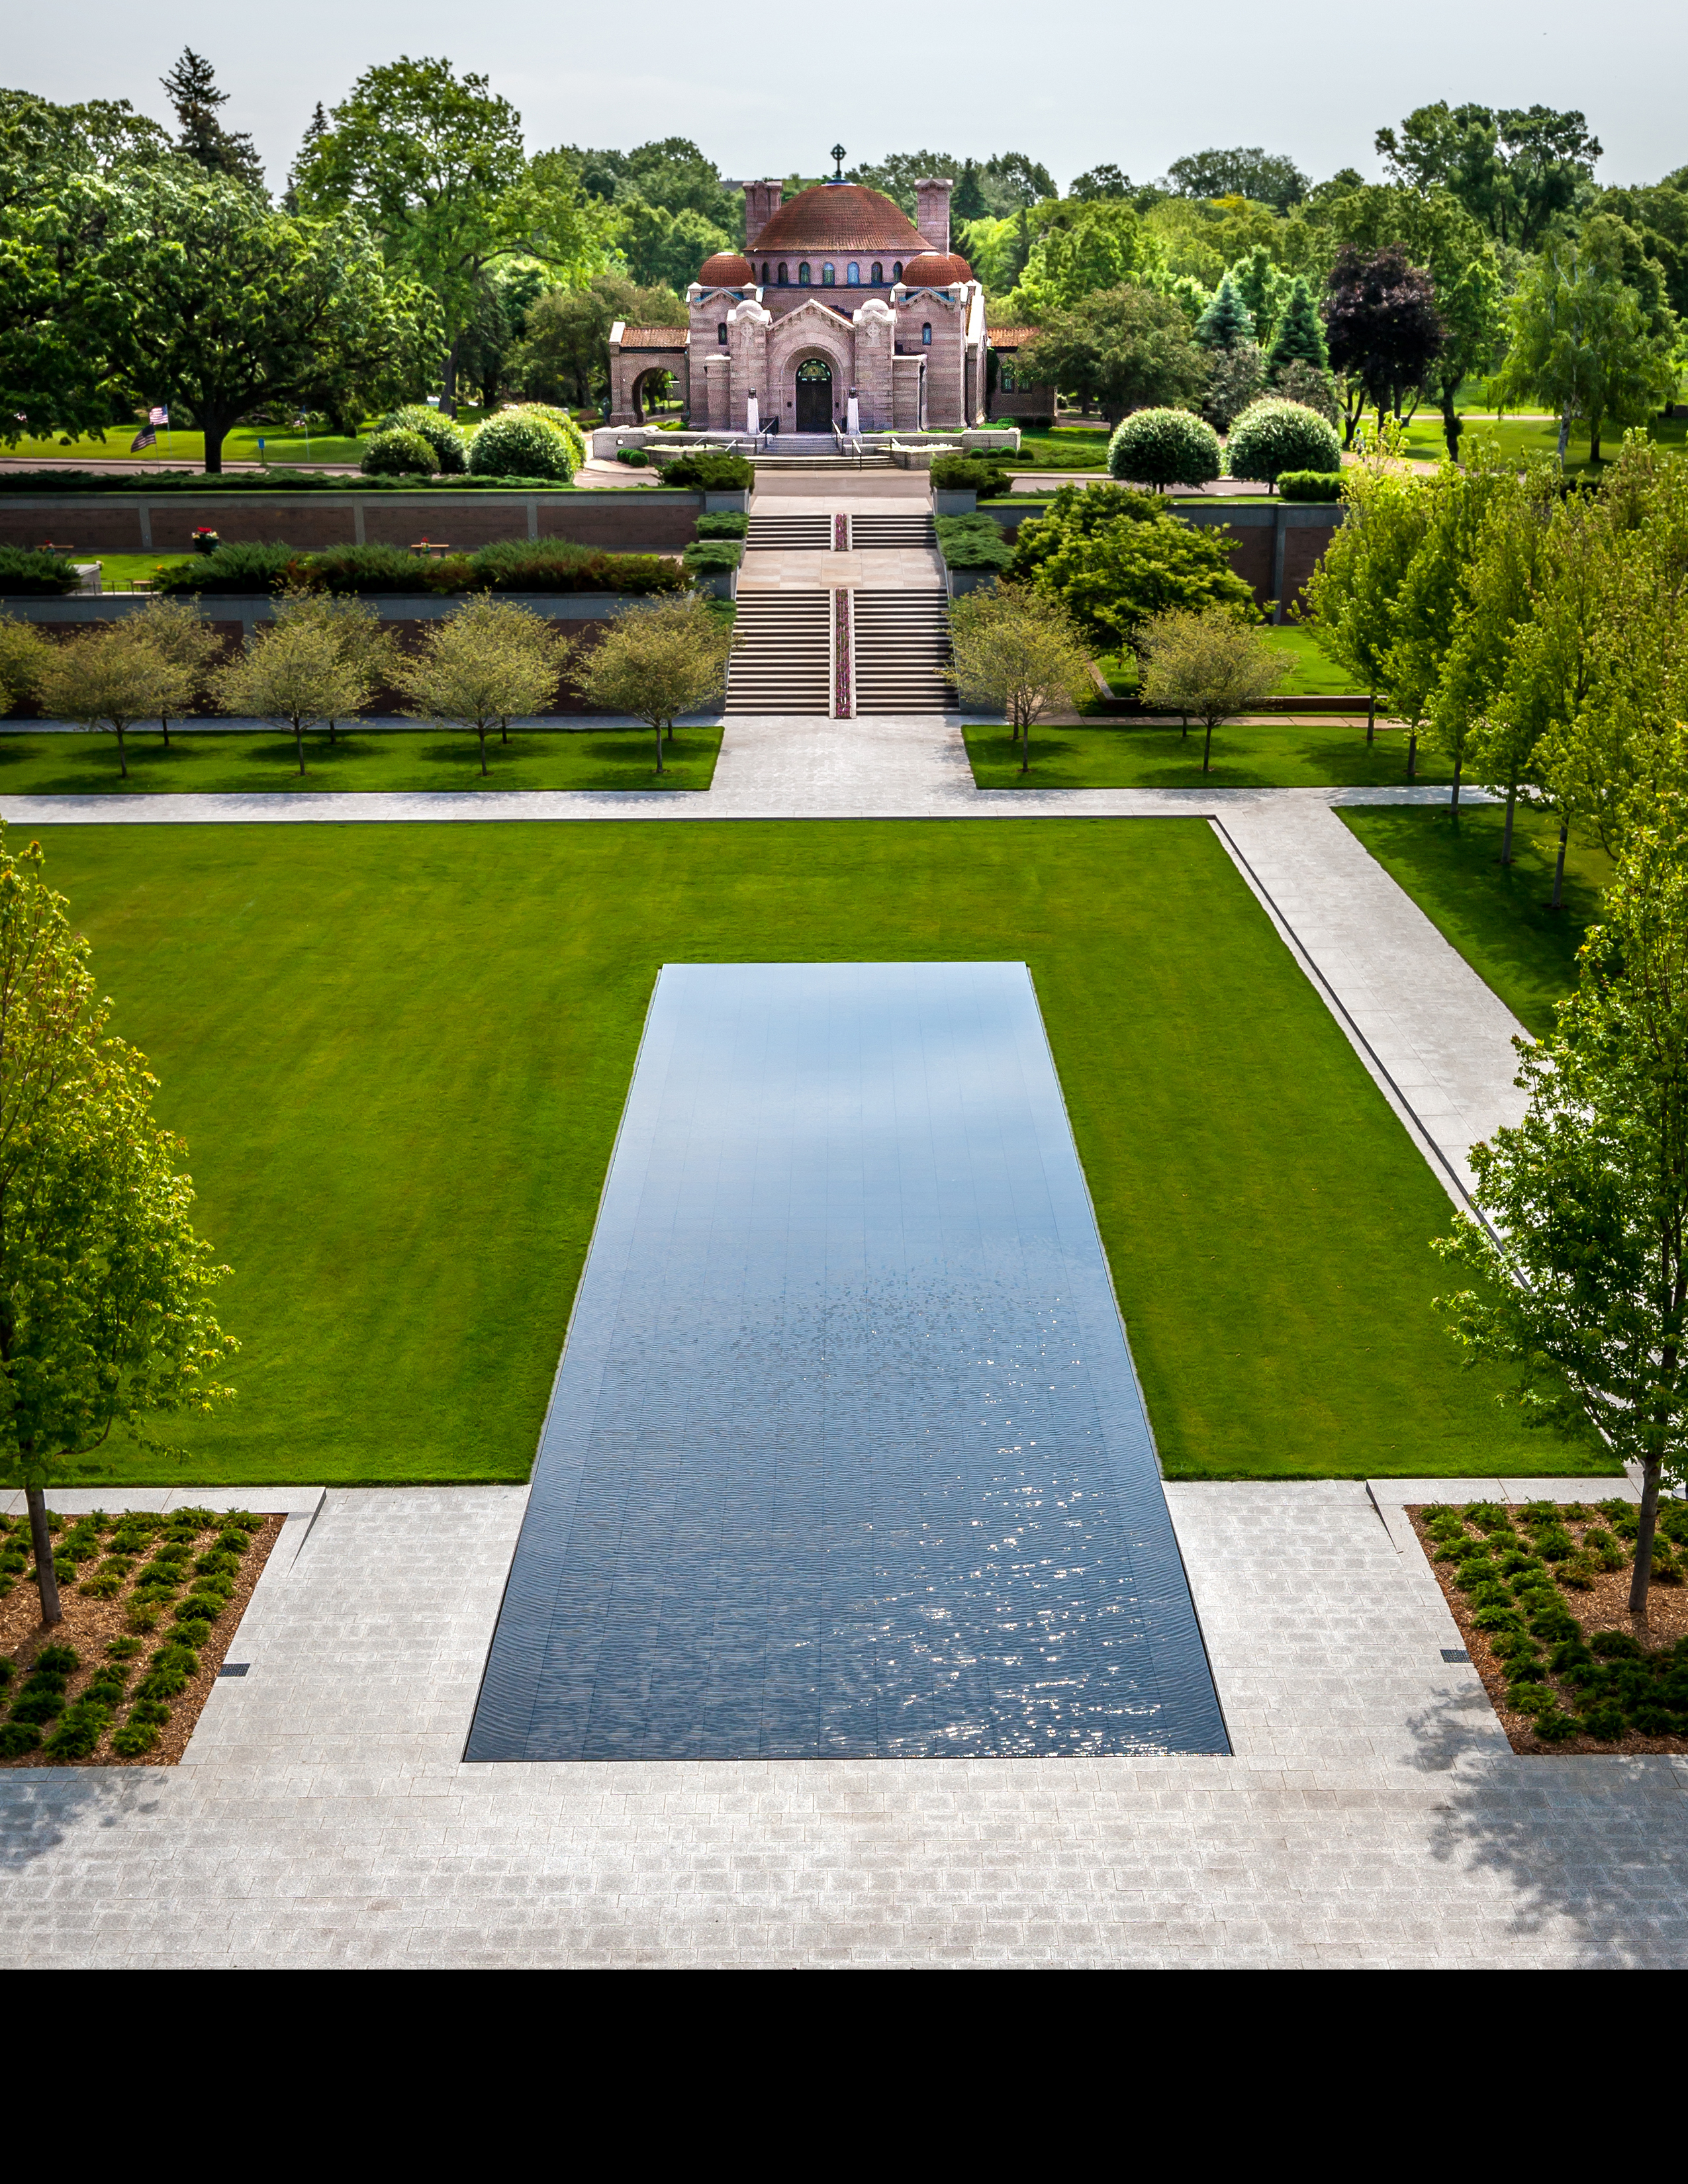 Asla 2013 professional awards lakewood garden mausoleum for Garden architecture